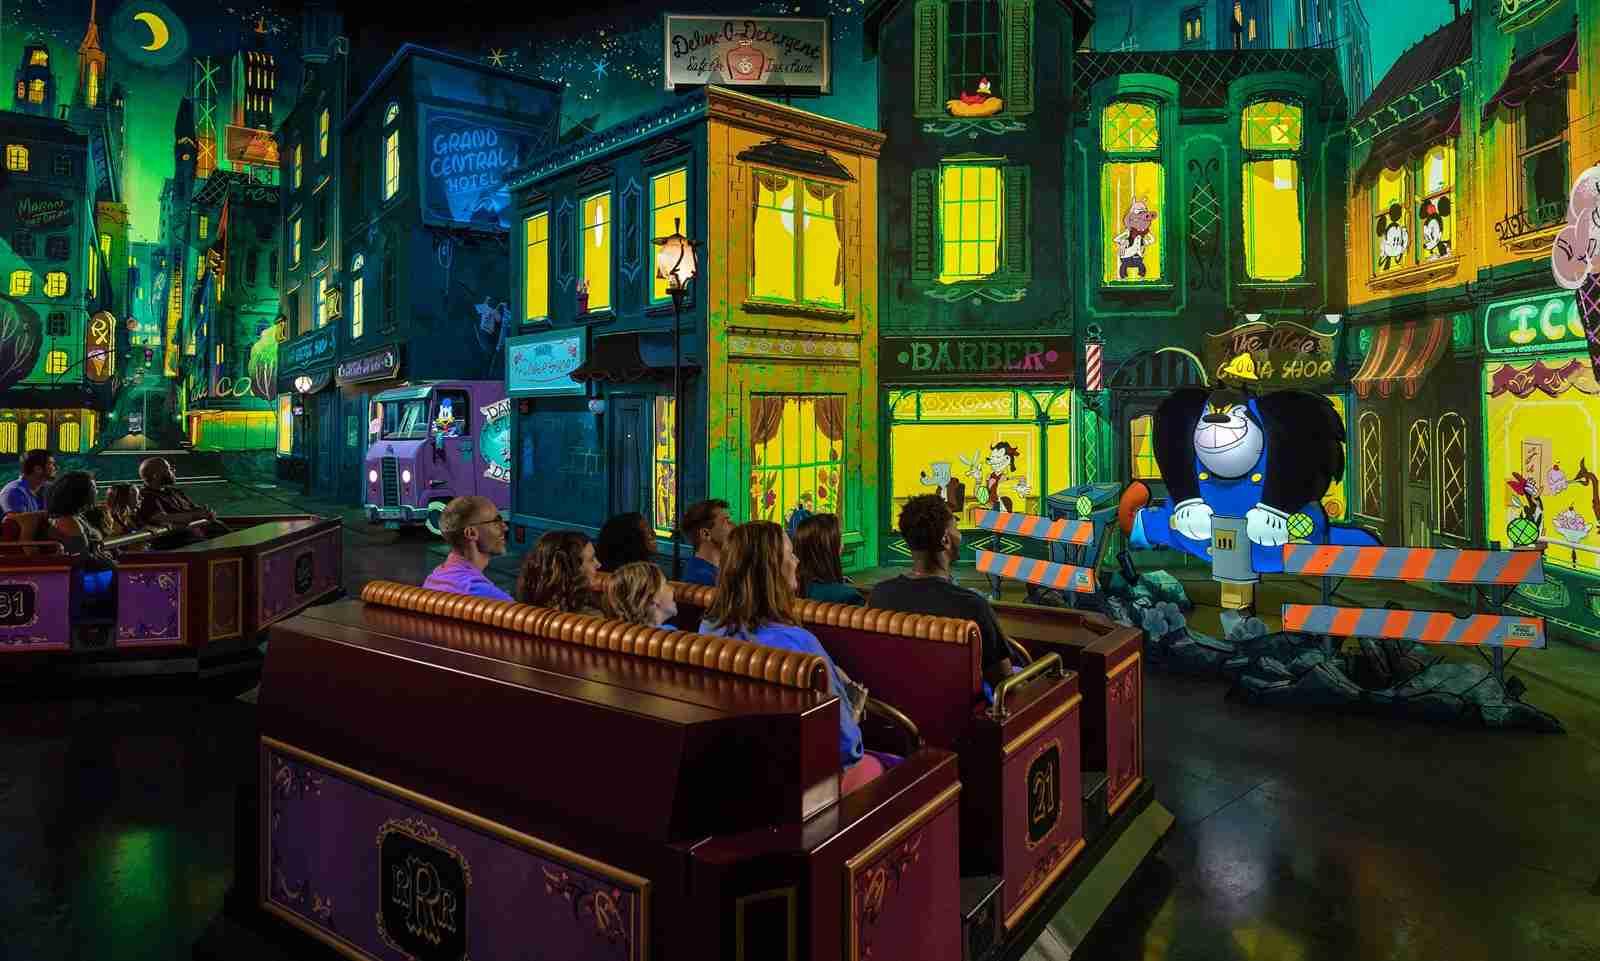 (Photo courtesy of Disney Parks)